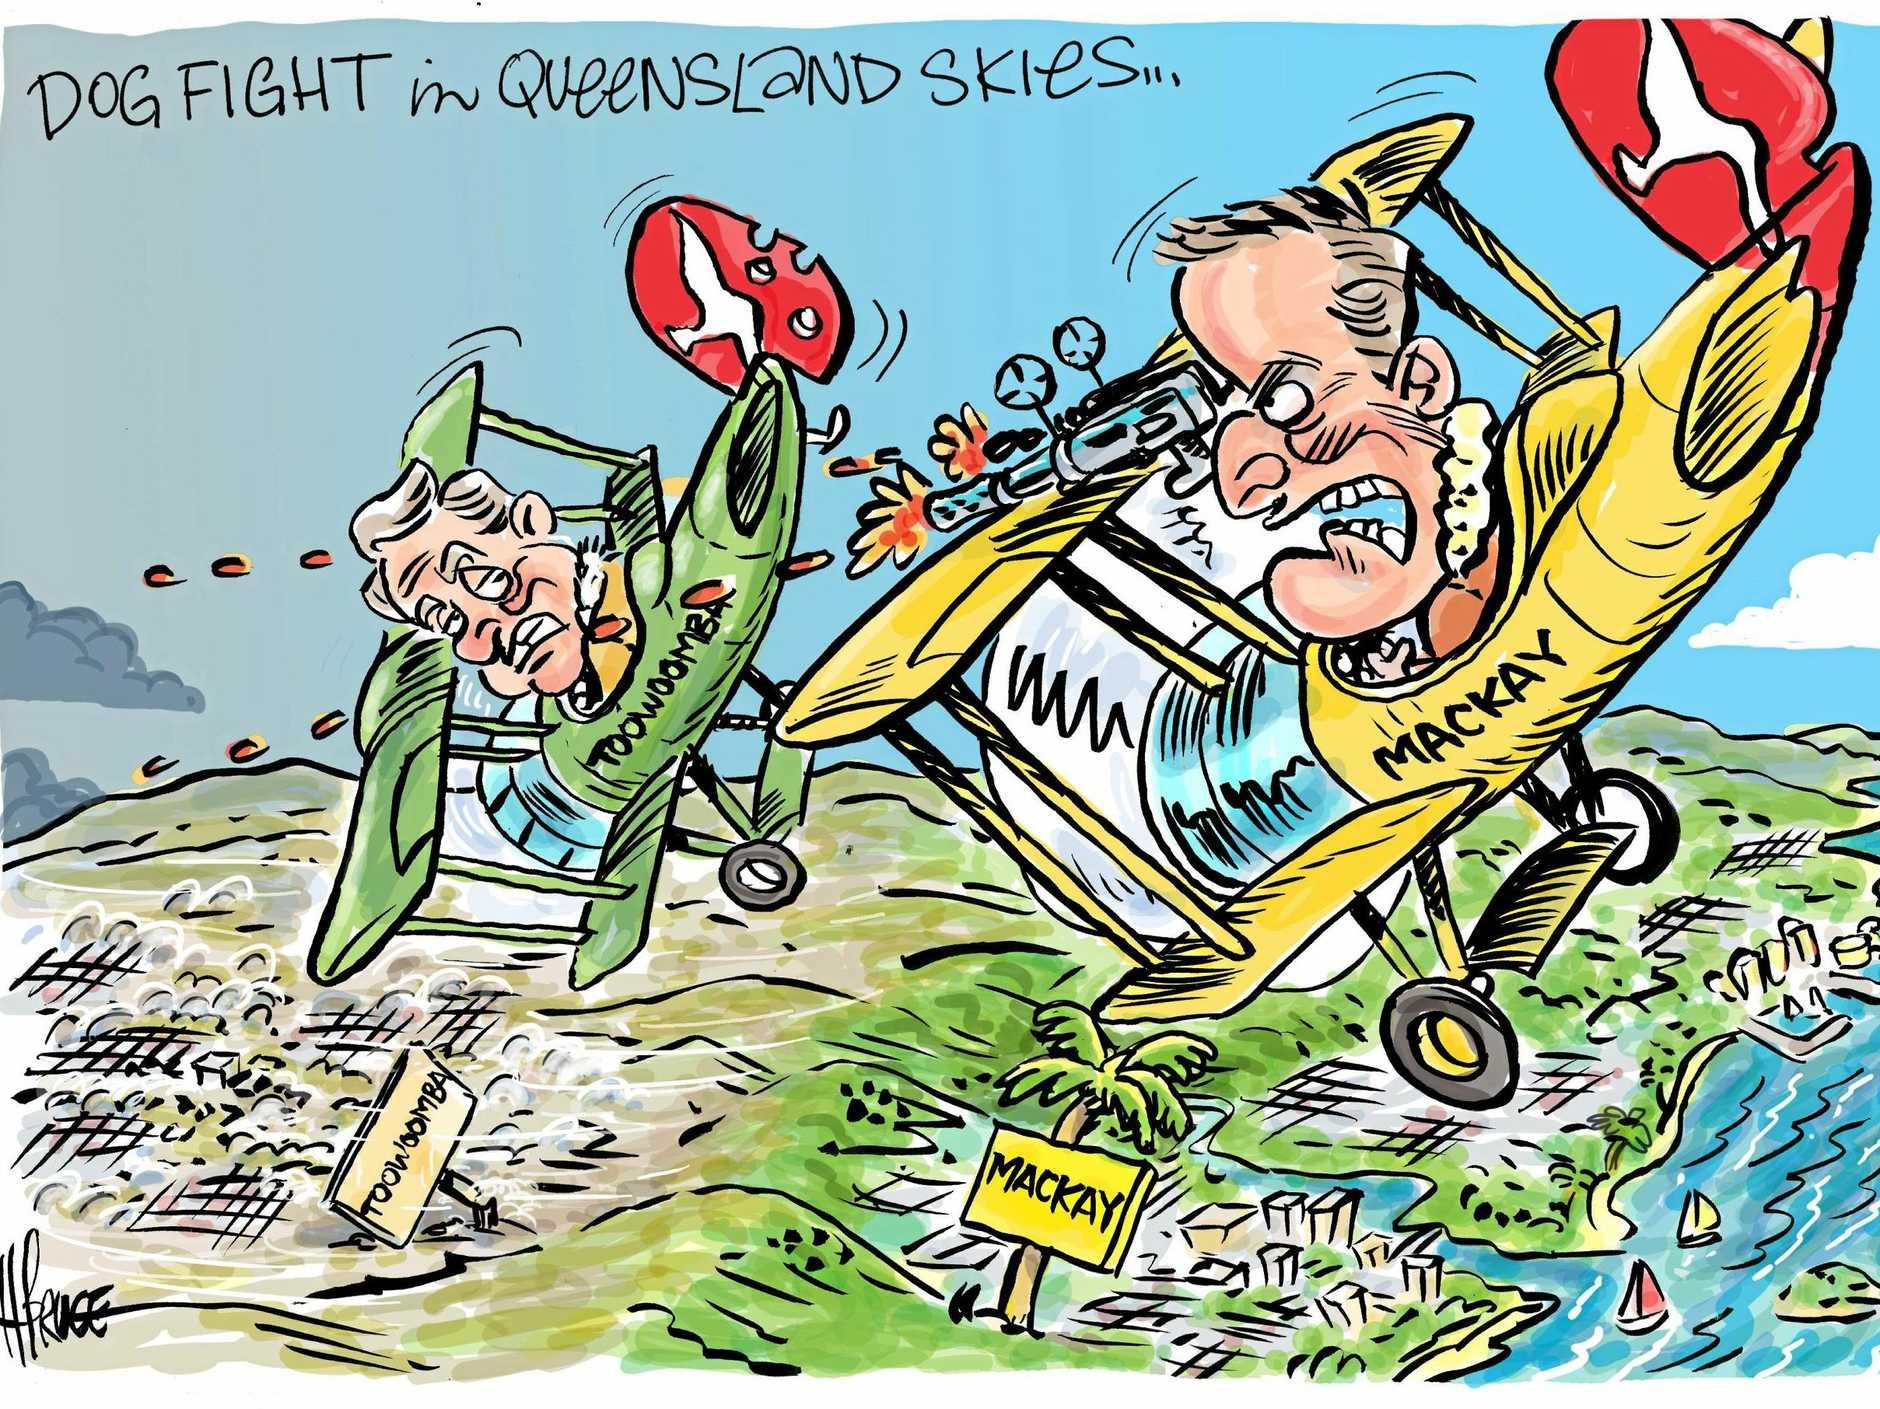 Toowoomba vs Mackay in Qantas bid